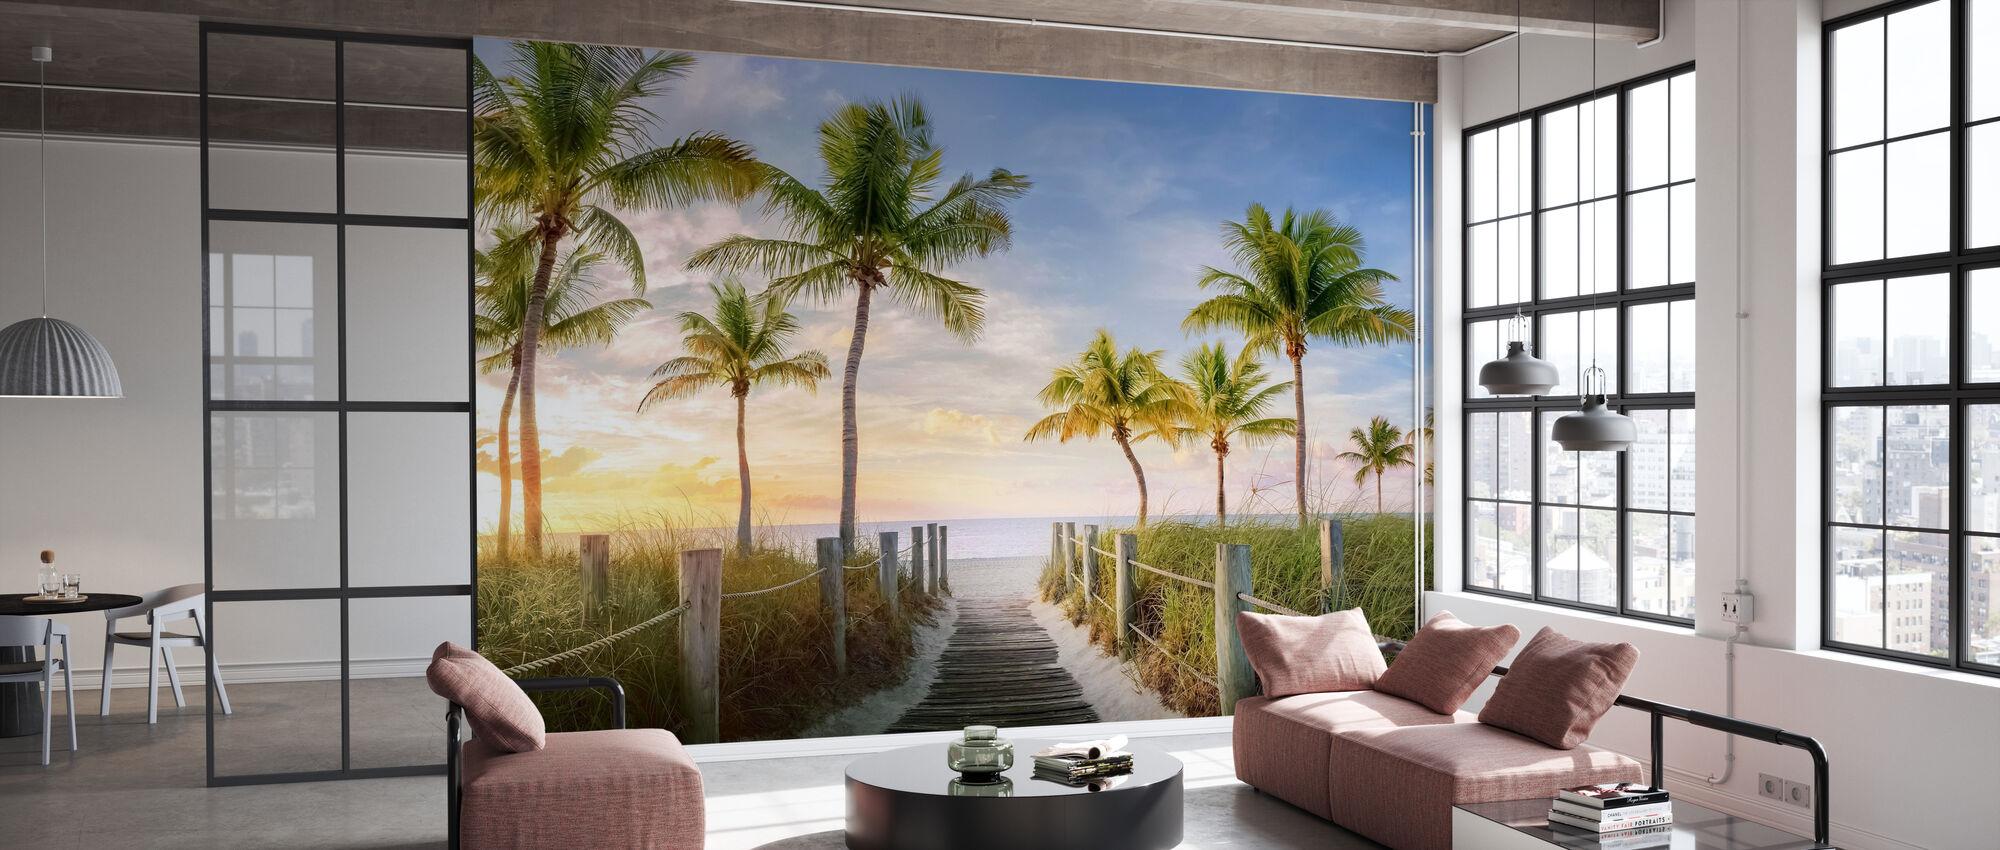 Footbridge to the Beach - Wallpaper - Office